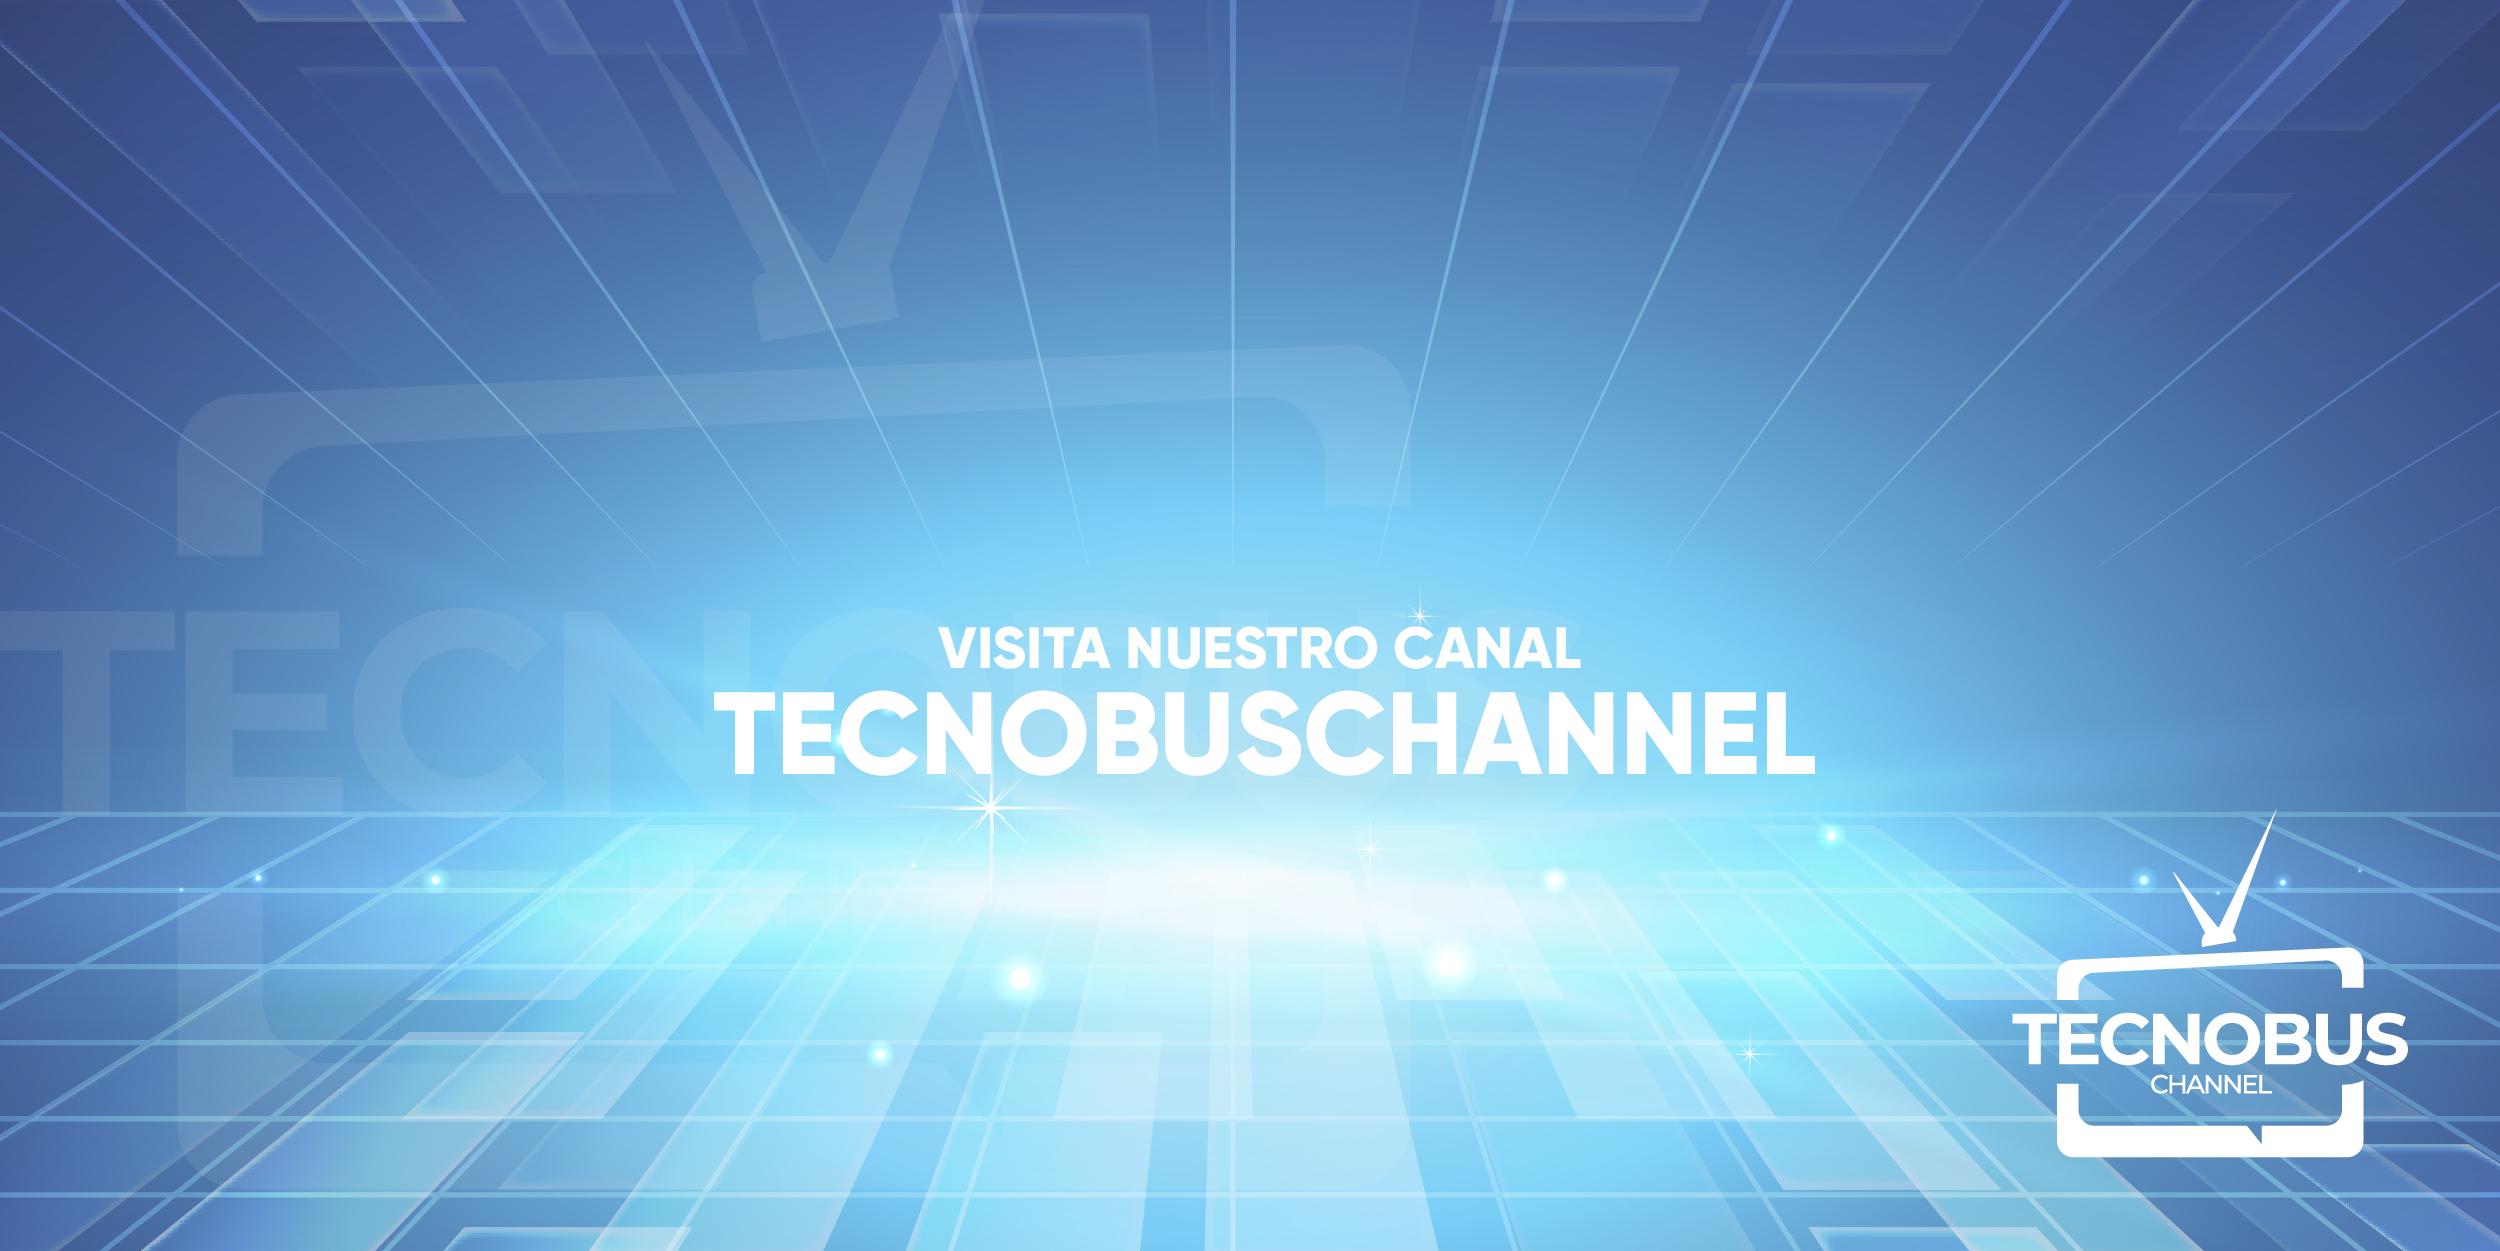 CANAL TECNOBUS